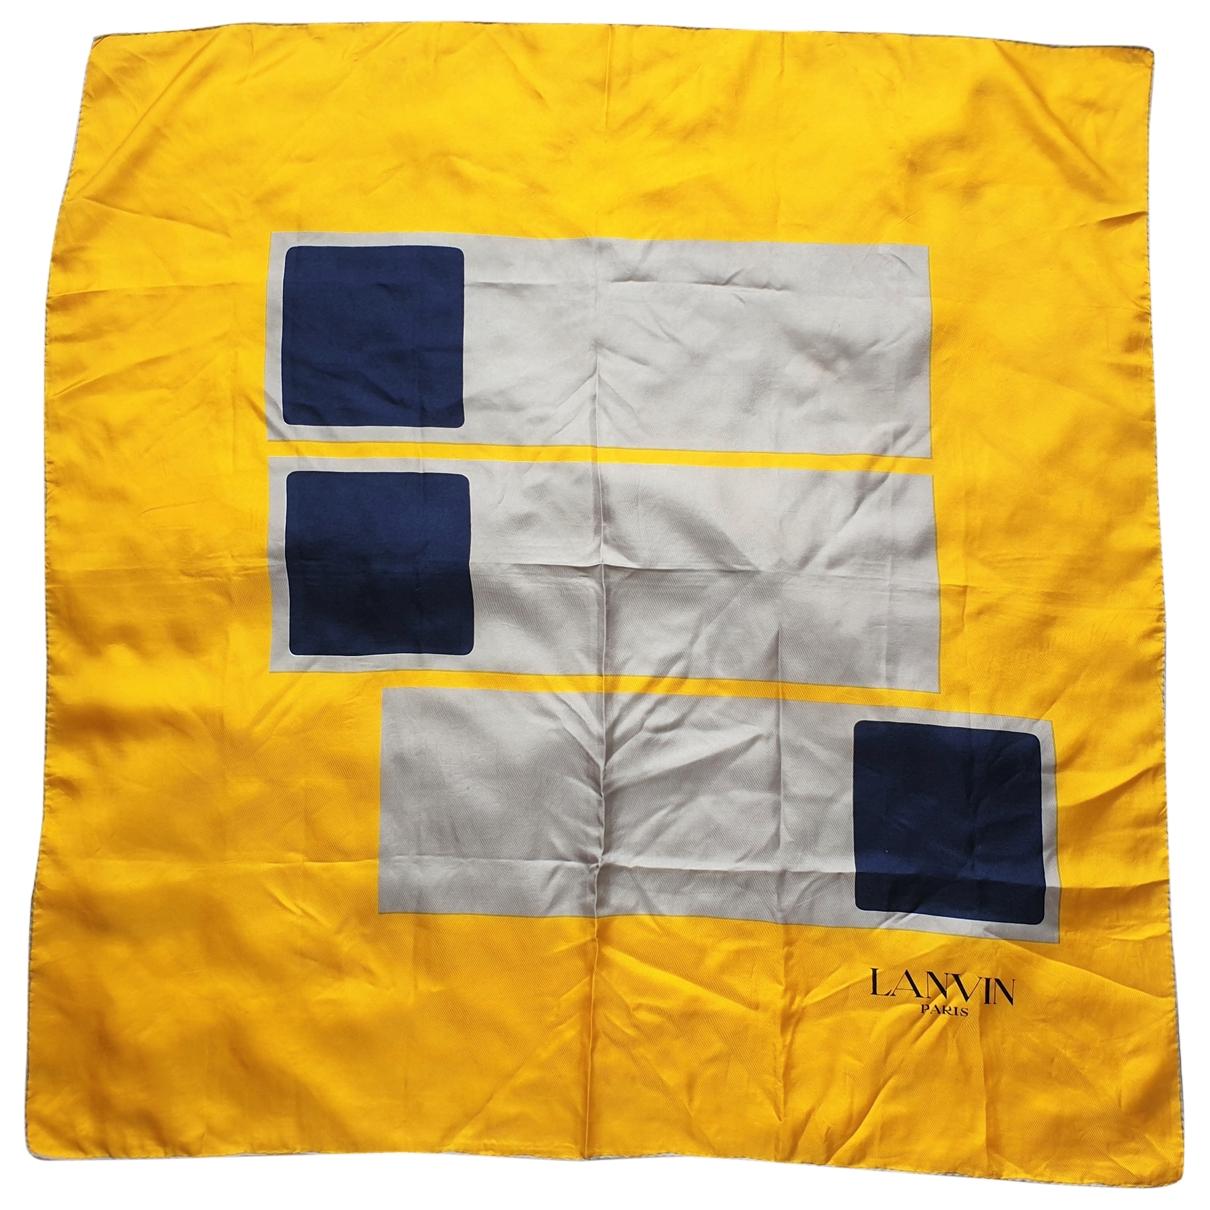 Lanvin \N Yellow Silk scarf for Women \N